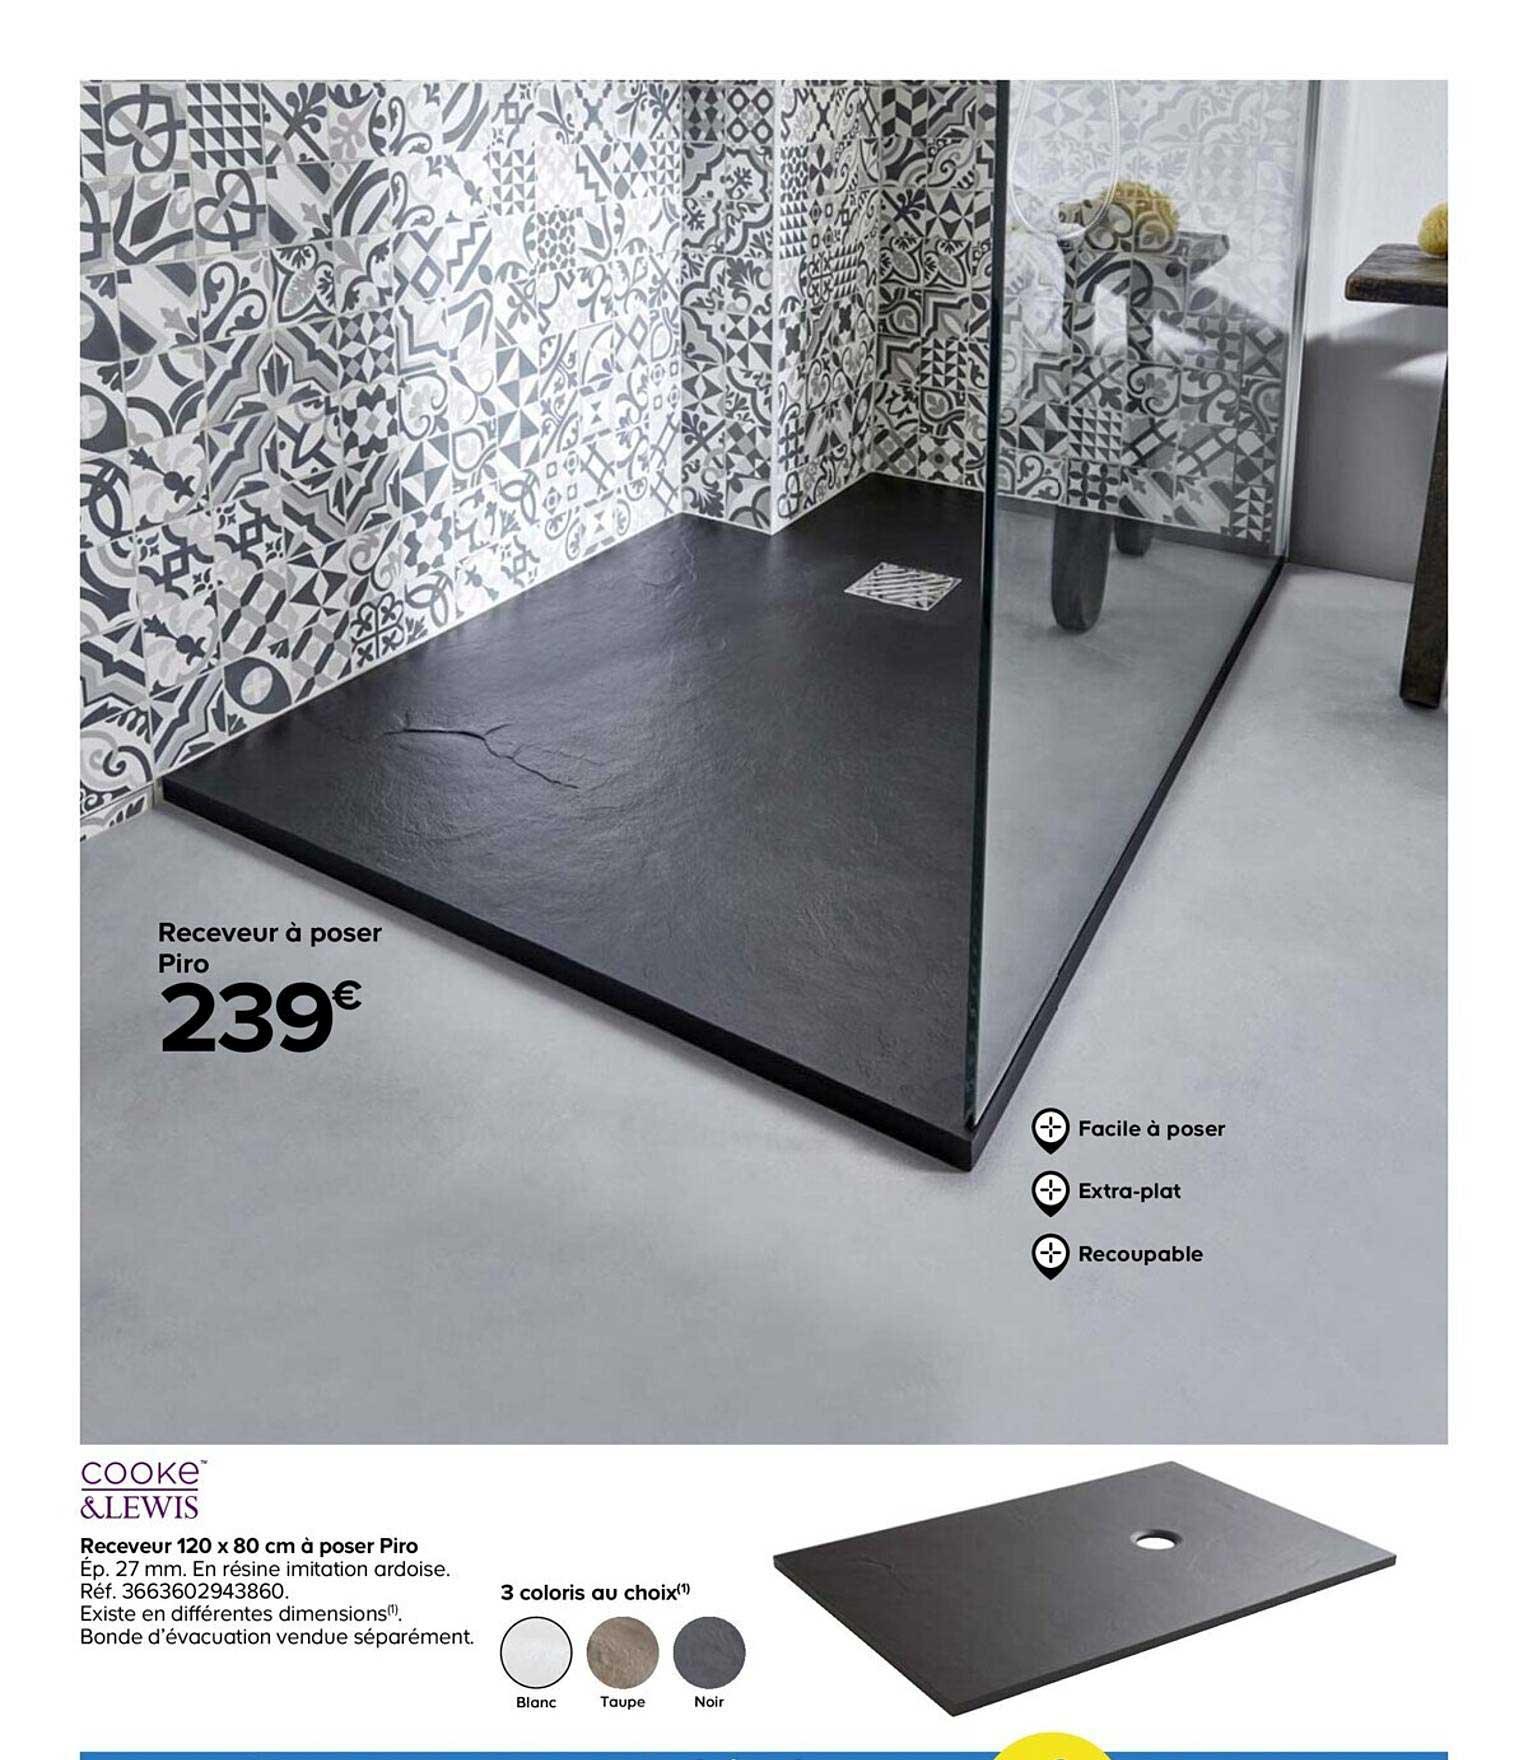 Castorama Cooke&lewis Receveur 120x80 Cm à Poser Pro